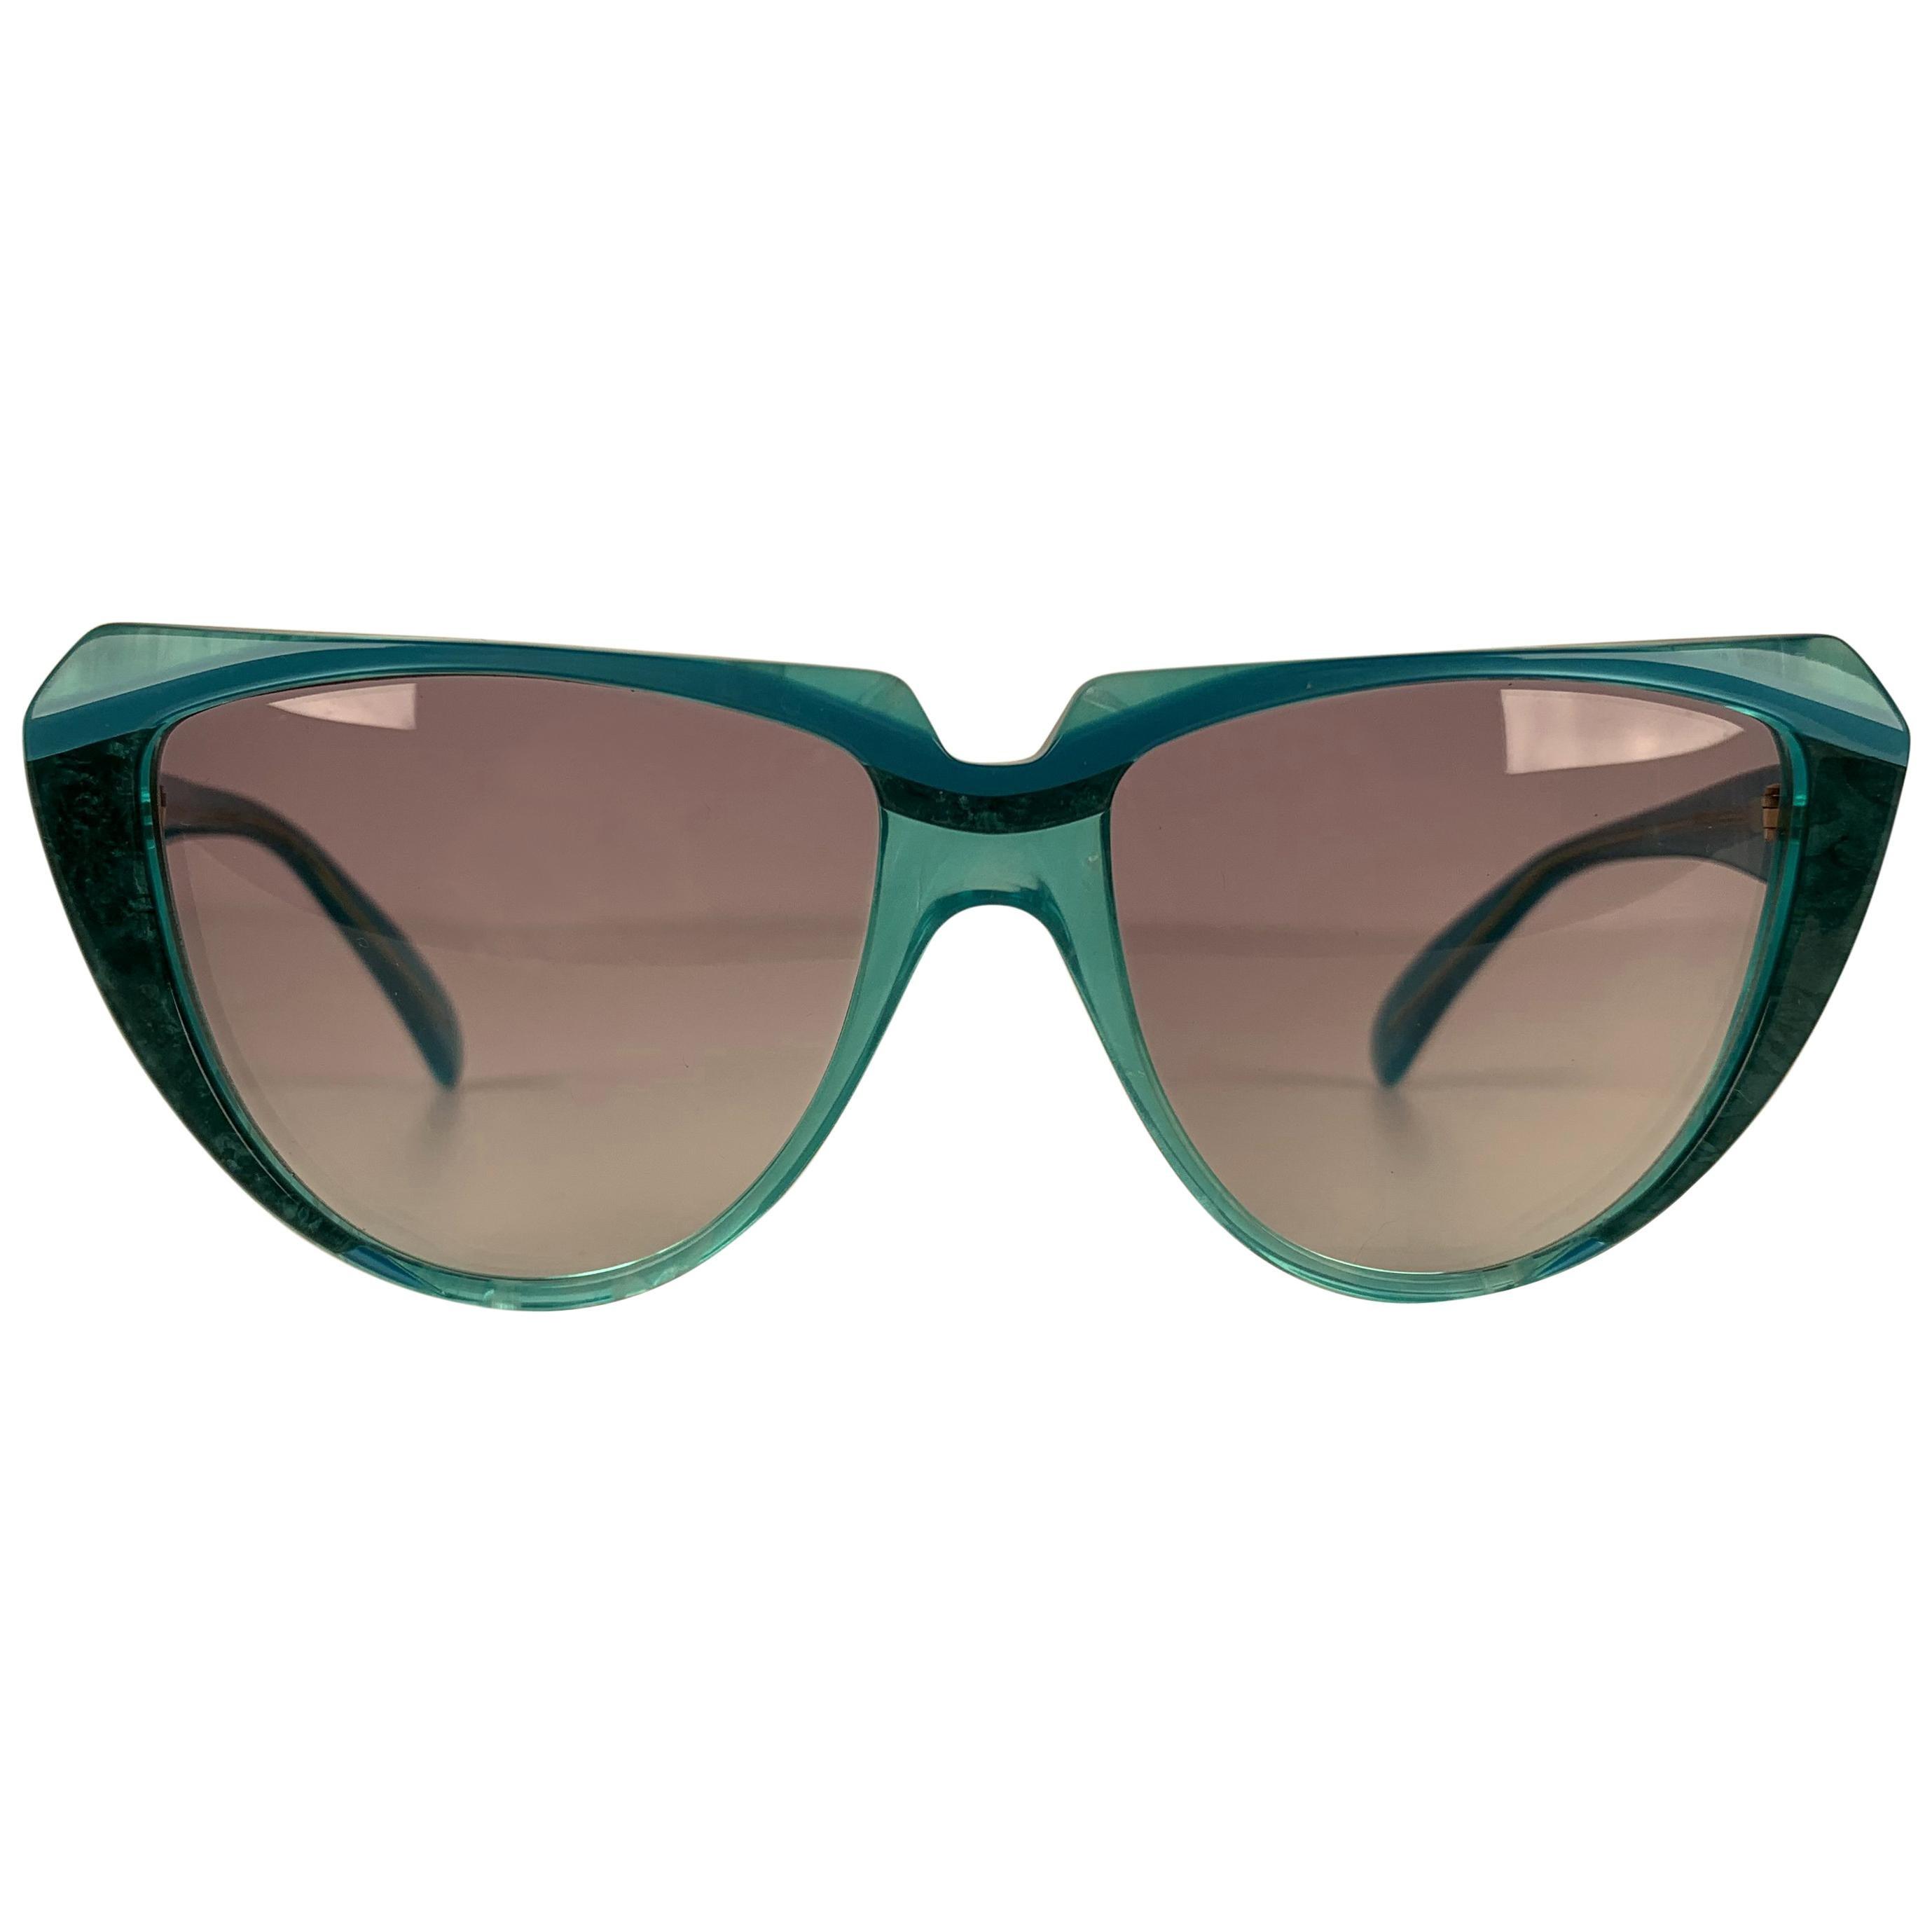 Yves Saint Laurent Vintage Cat Eye Turquoise Sunglasses 8704 P 71